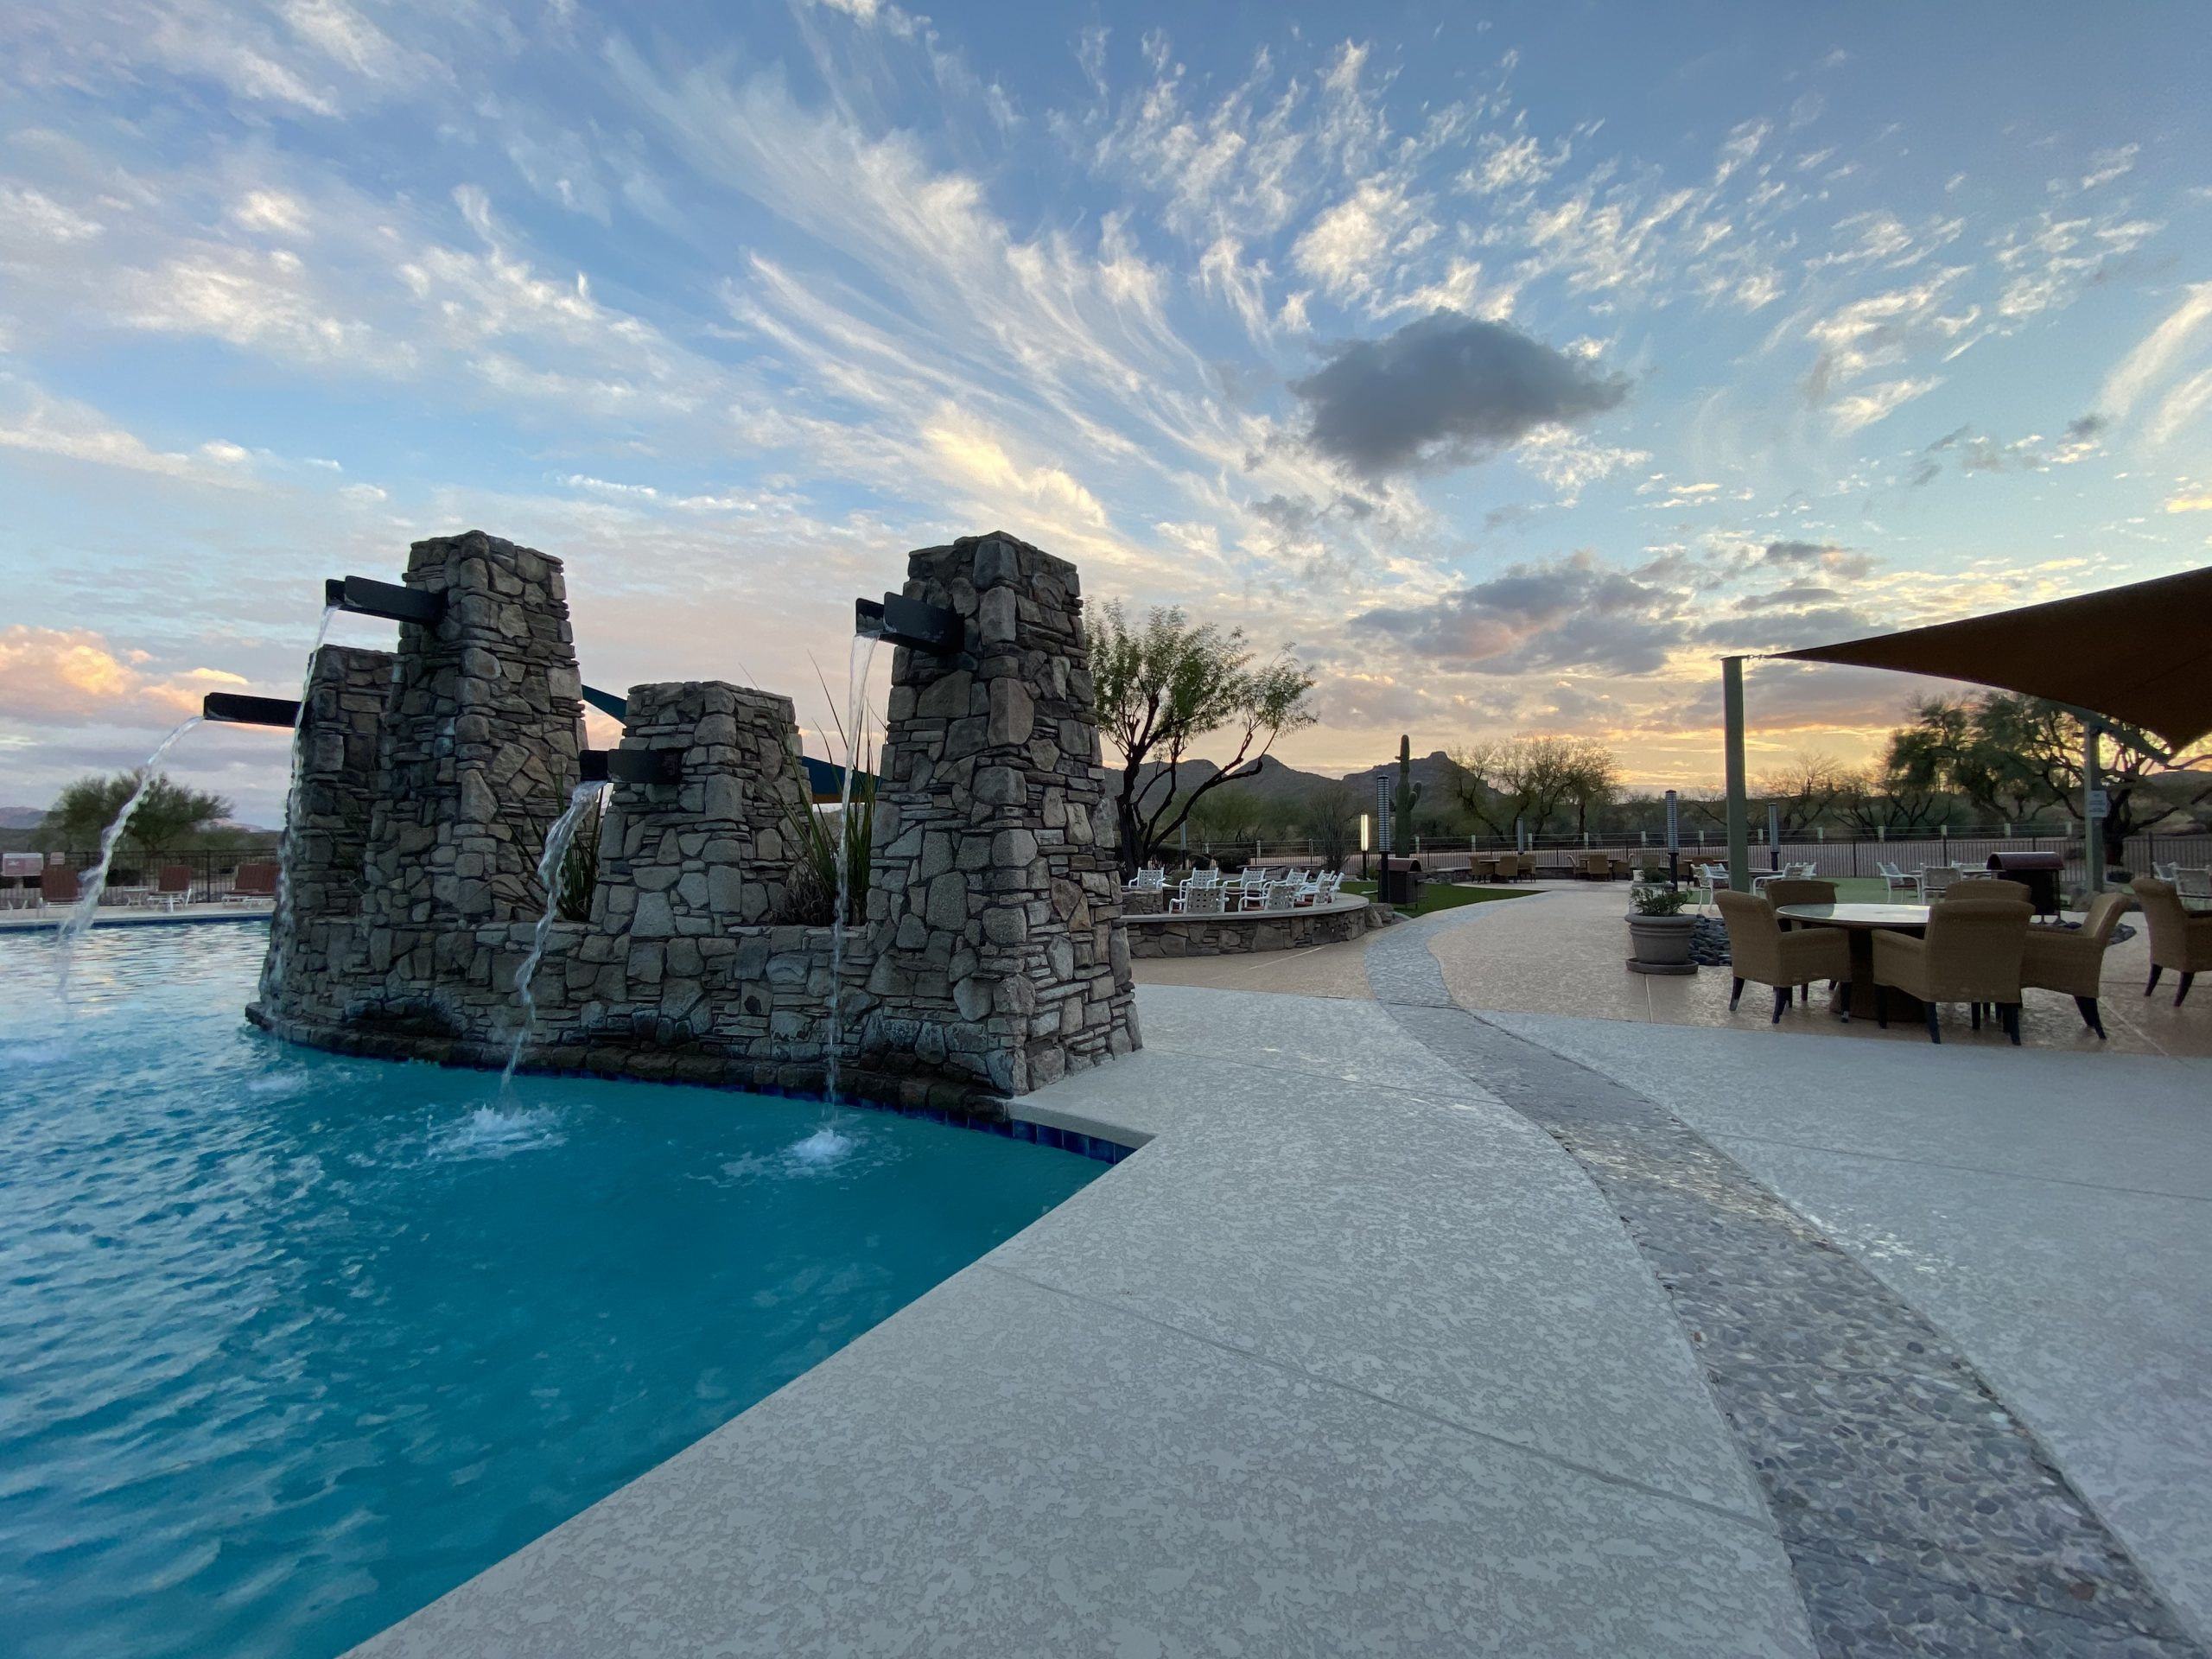 We-Ko-Pa Casino Resort: A 4-Star Hotel in the Desert